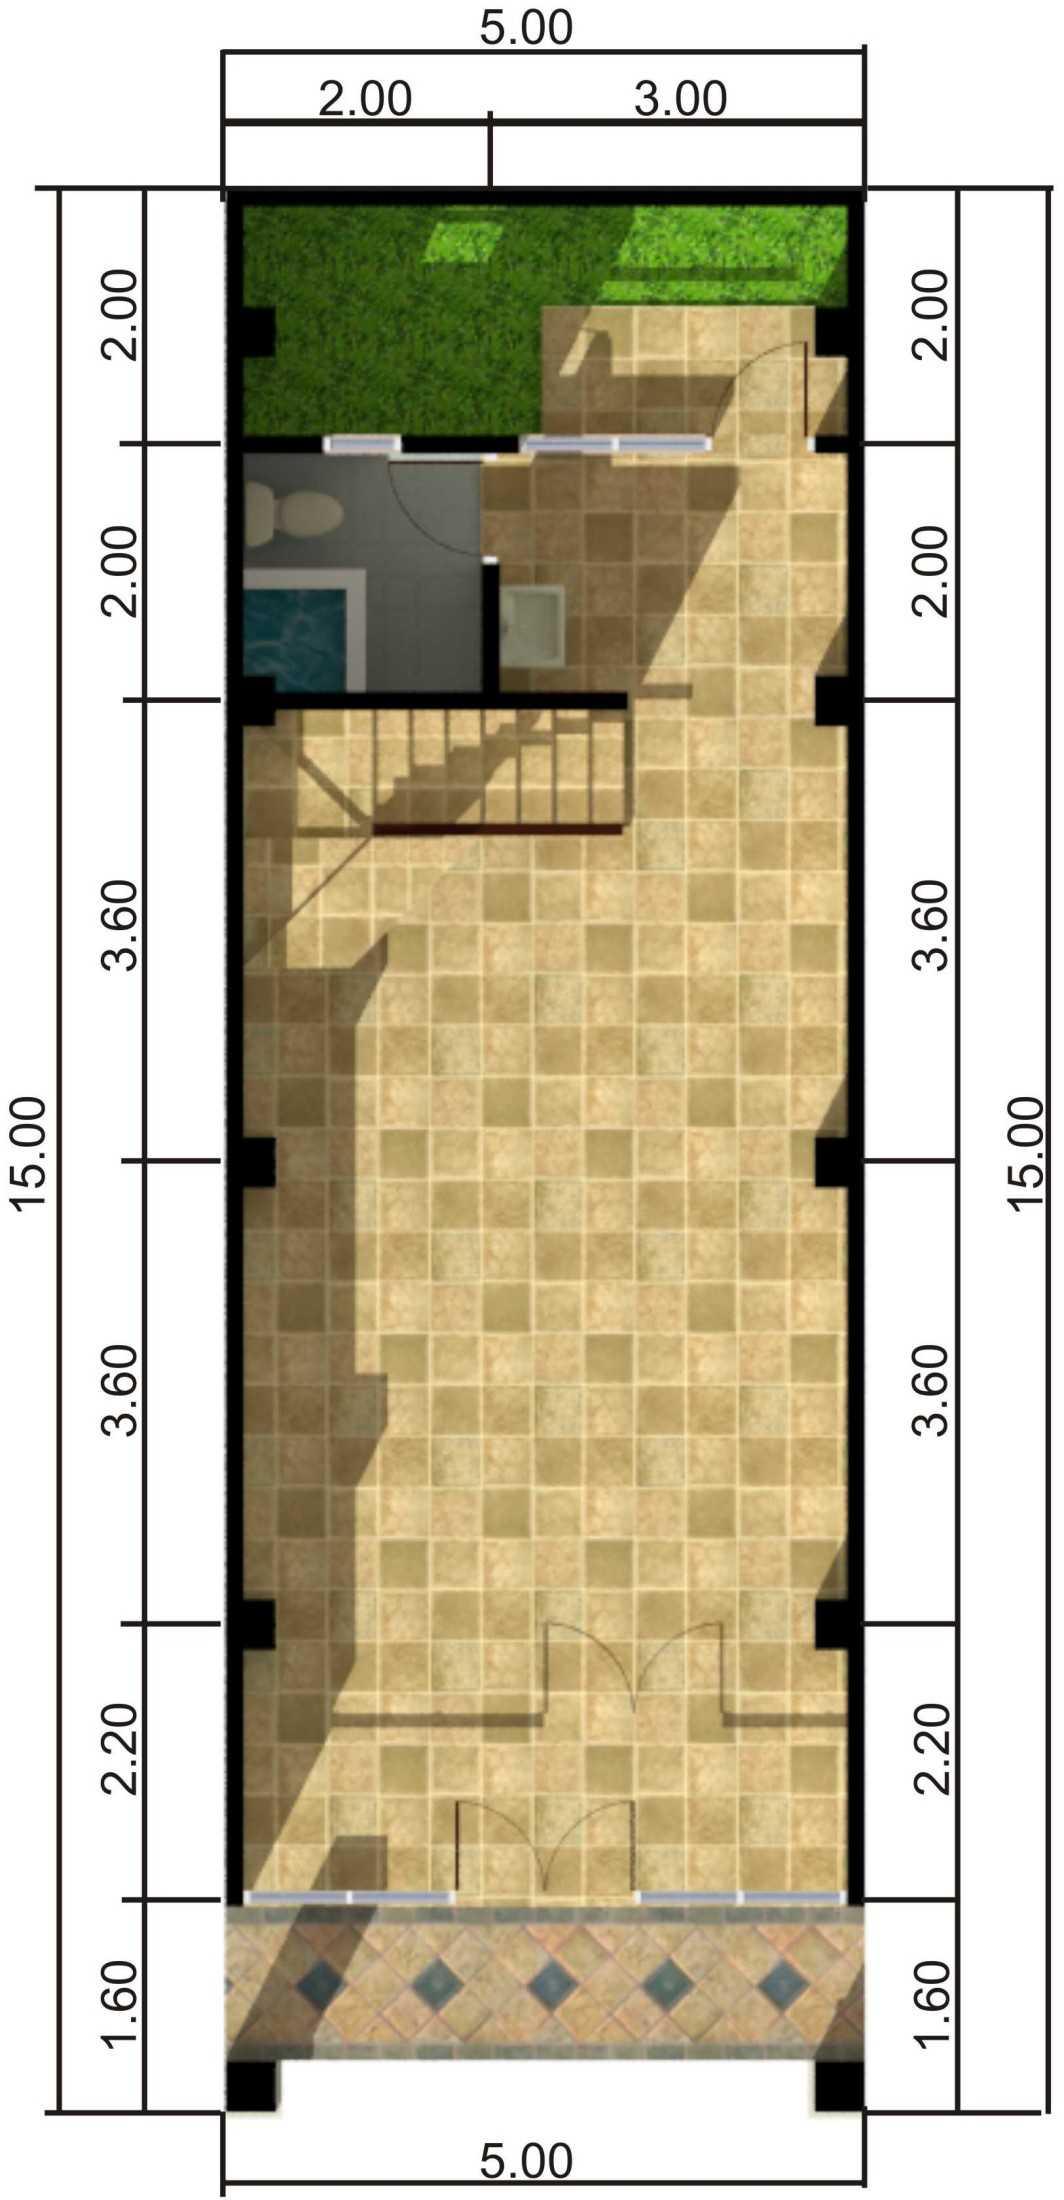 4Linked Architect Ruko Perumahan Majapahit Kabupaten Sidoarjo, Jawa Timur, Indonesia Kabupaten Sidoarjo, Jawa Timur, Indonesia 4Linked-Architect-Ruko-Perumahan-Majapahit  75200